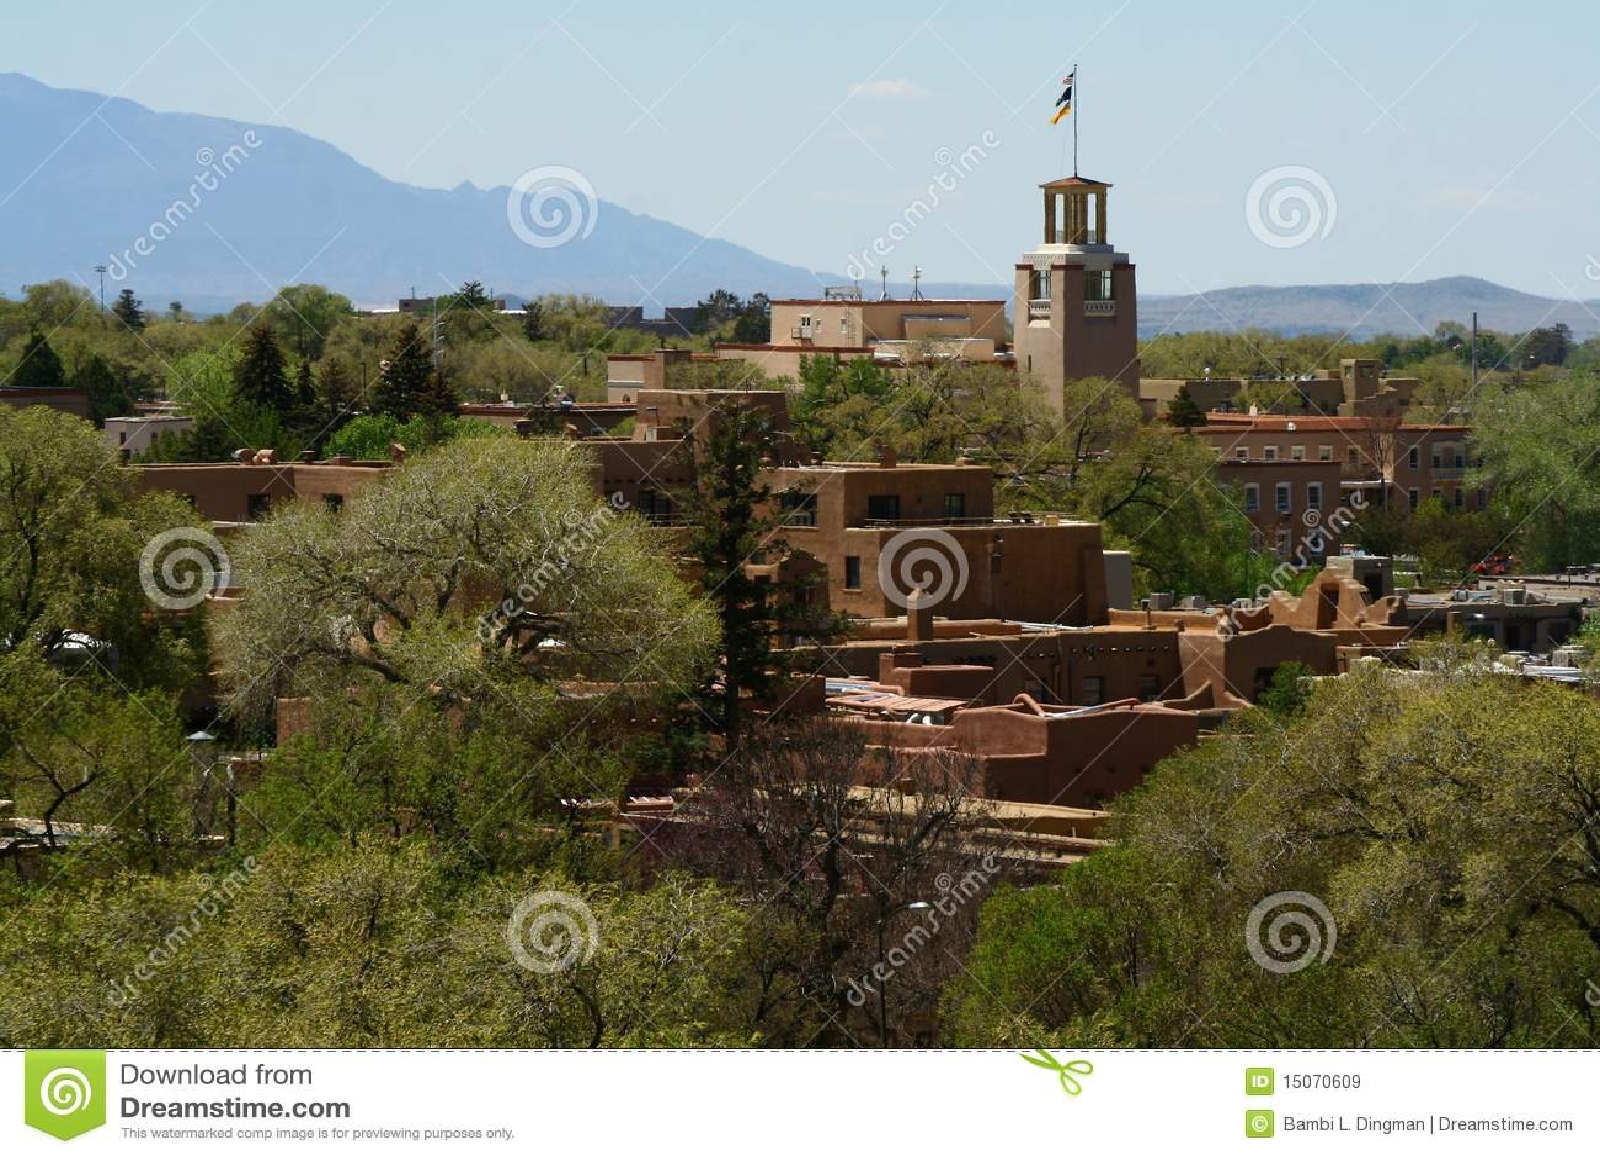 Web Design Santa Fe New Mexico